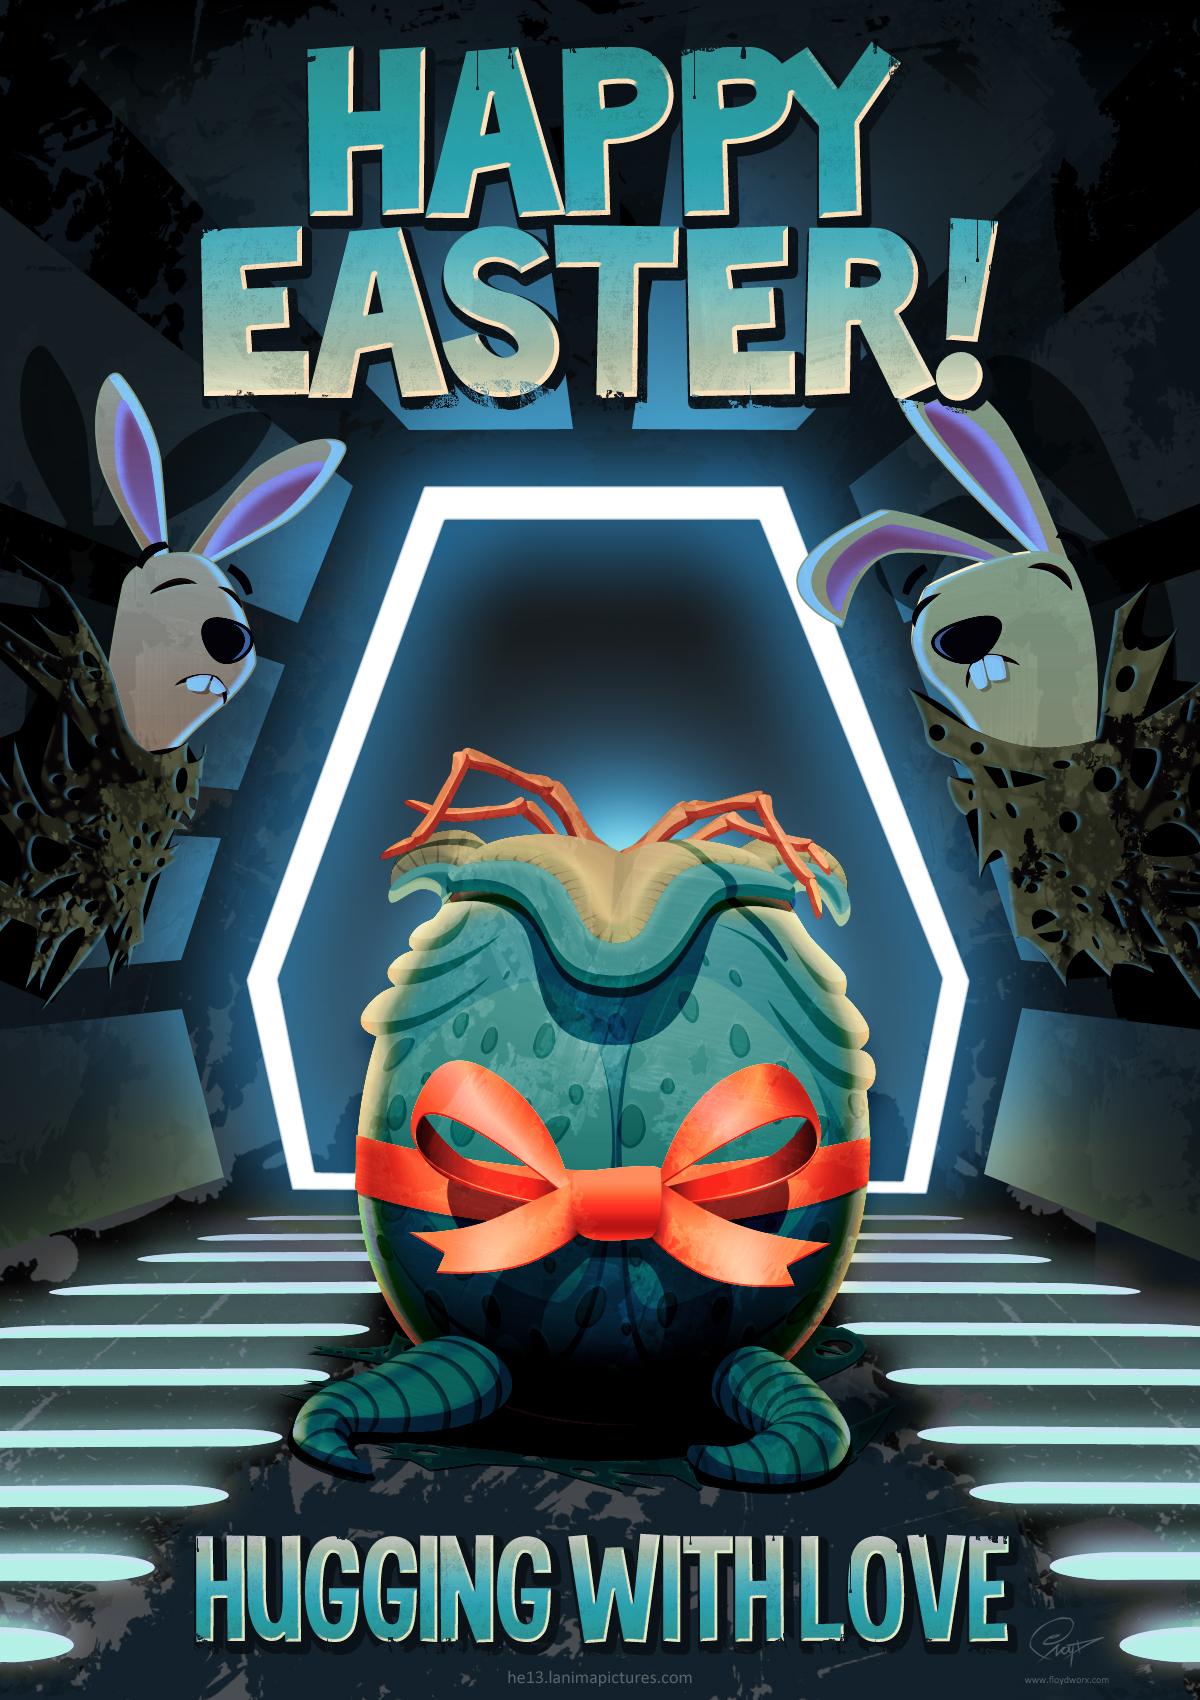 Alien easter egg by floydworx